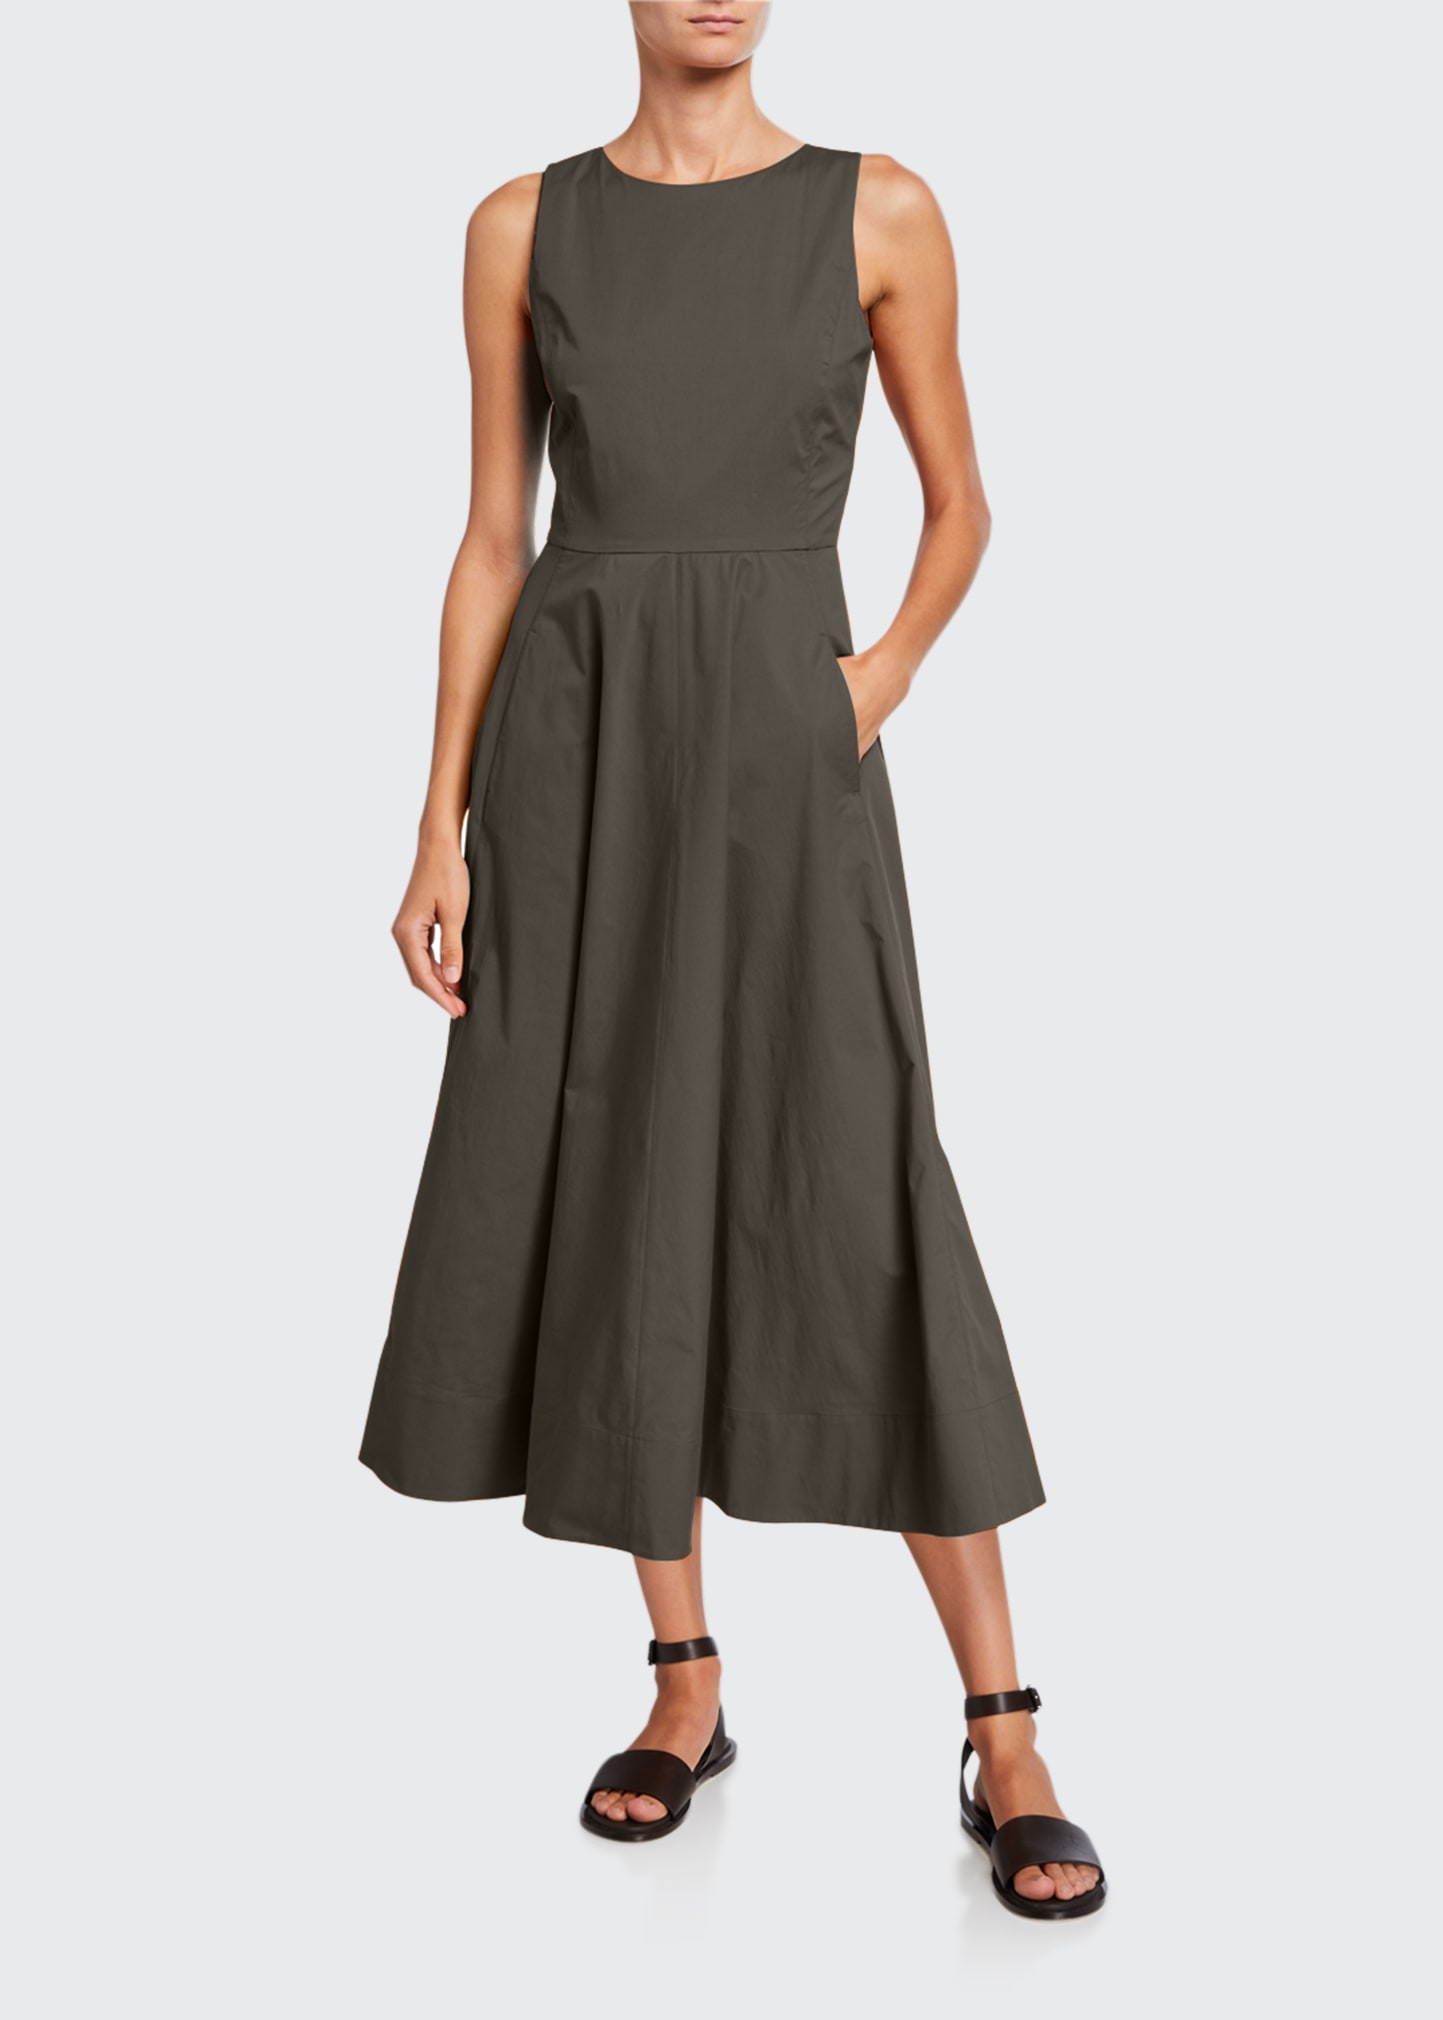 Loro Piana NANCY SLEEVELESS POPLIN A-LINE DRESS